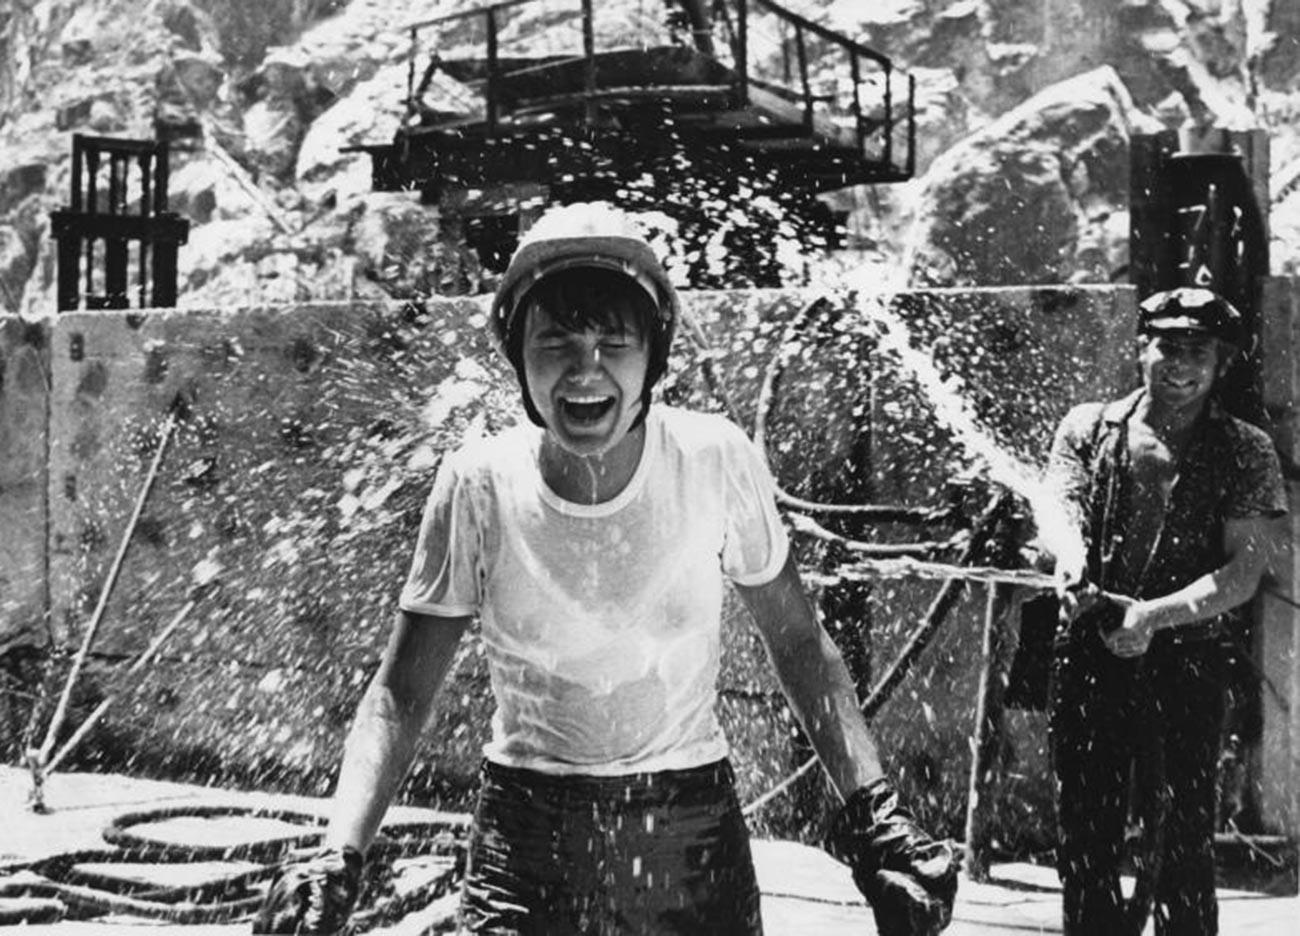 Lokasi konstruksi pembangkit listrik tenaga air Toktogulskaya, Kyrgyztan, 1975-1976.